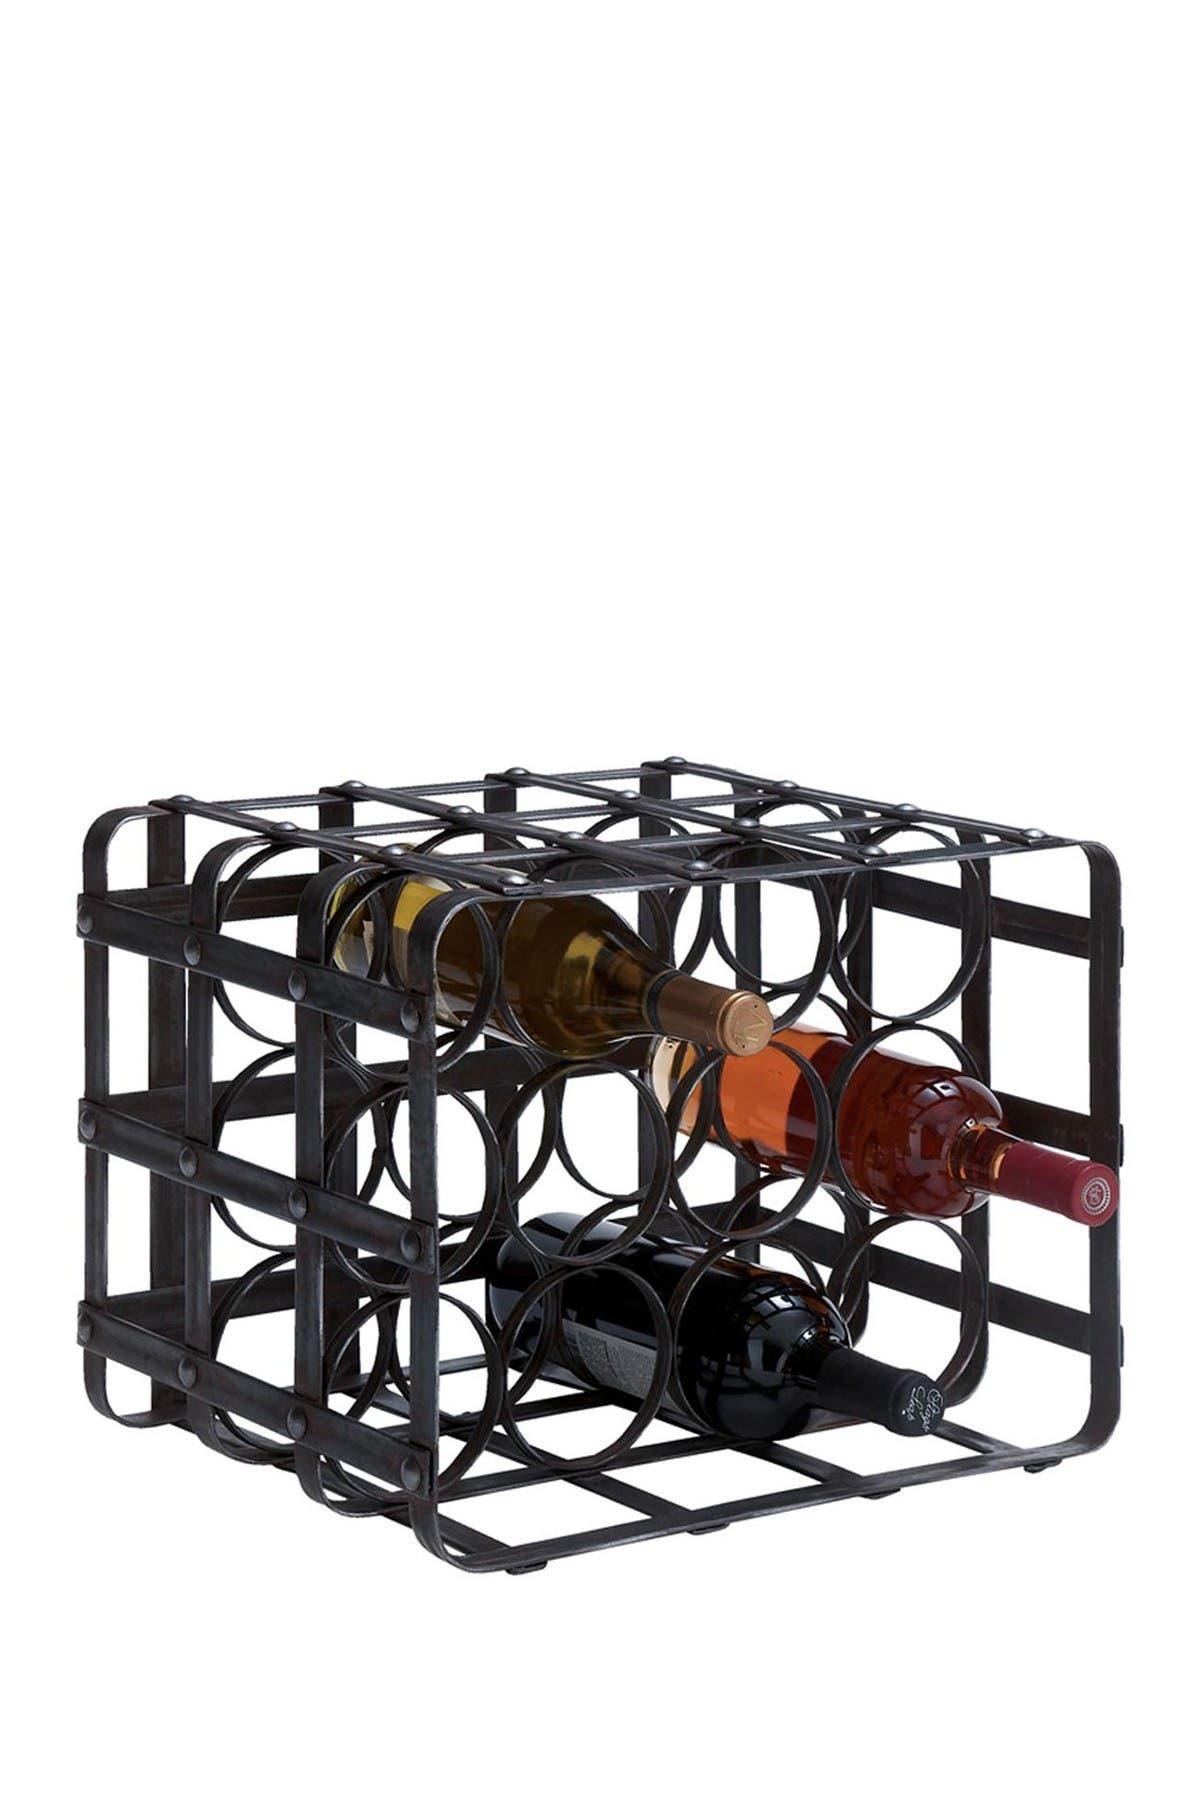 Willow Row Metal Wine Rack at Nordstrom Rack